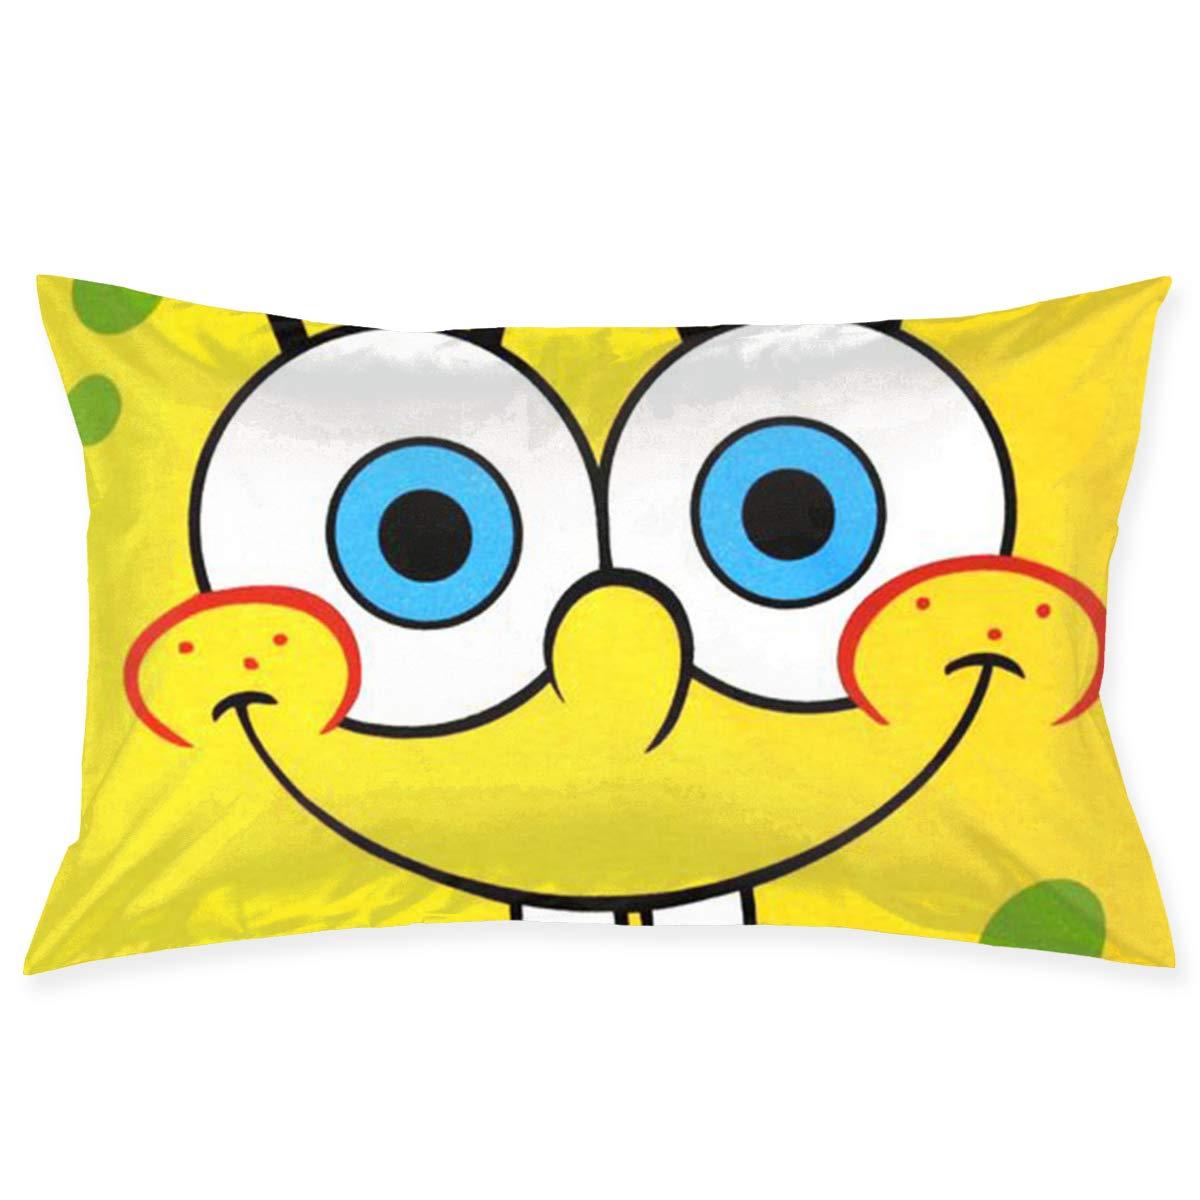 Amazoncom Hyhaczx Cute Spongebob Sofa Office Decorative Pillowslip